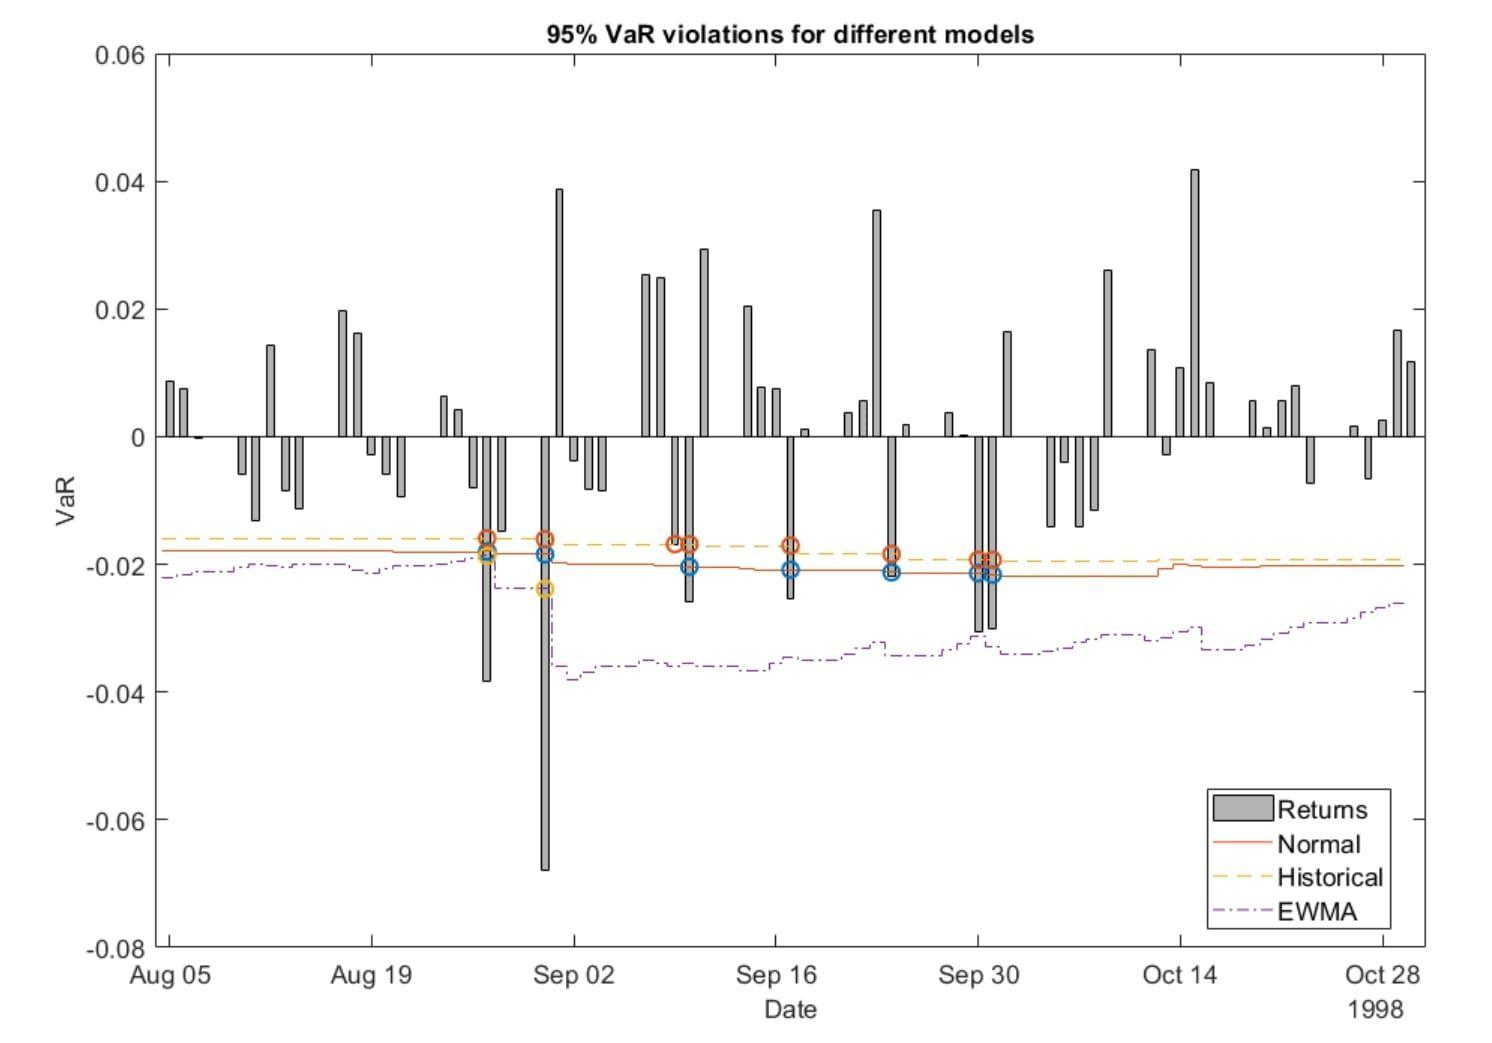 Visualizing VaR model violations